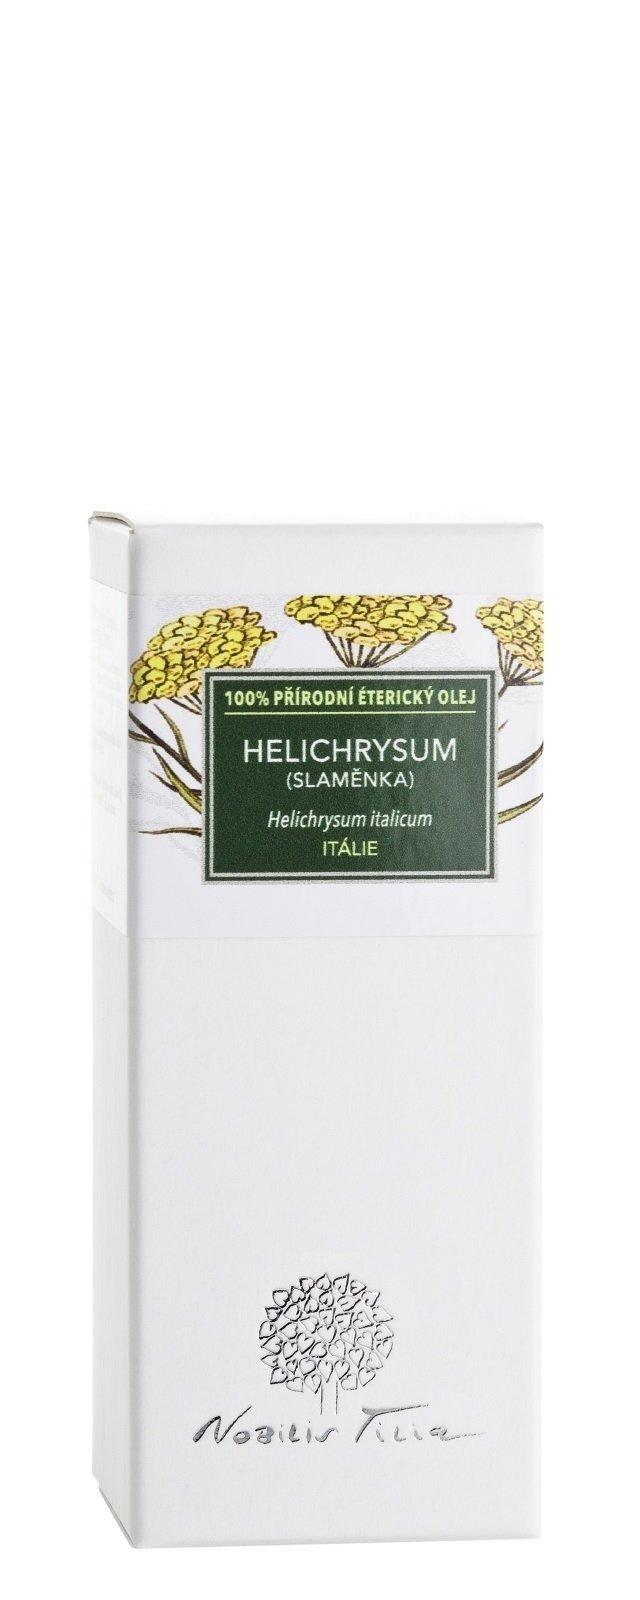 Éterický olej Helichrysum (slaměnka): 1 ml